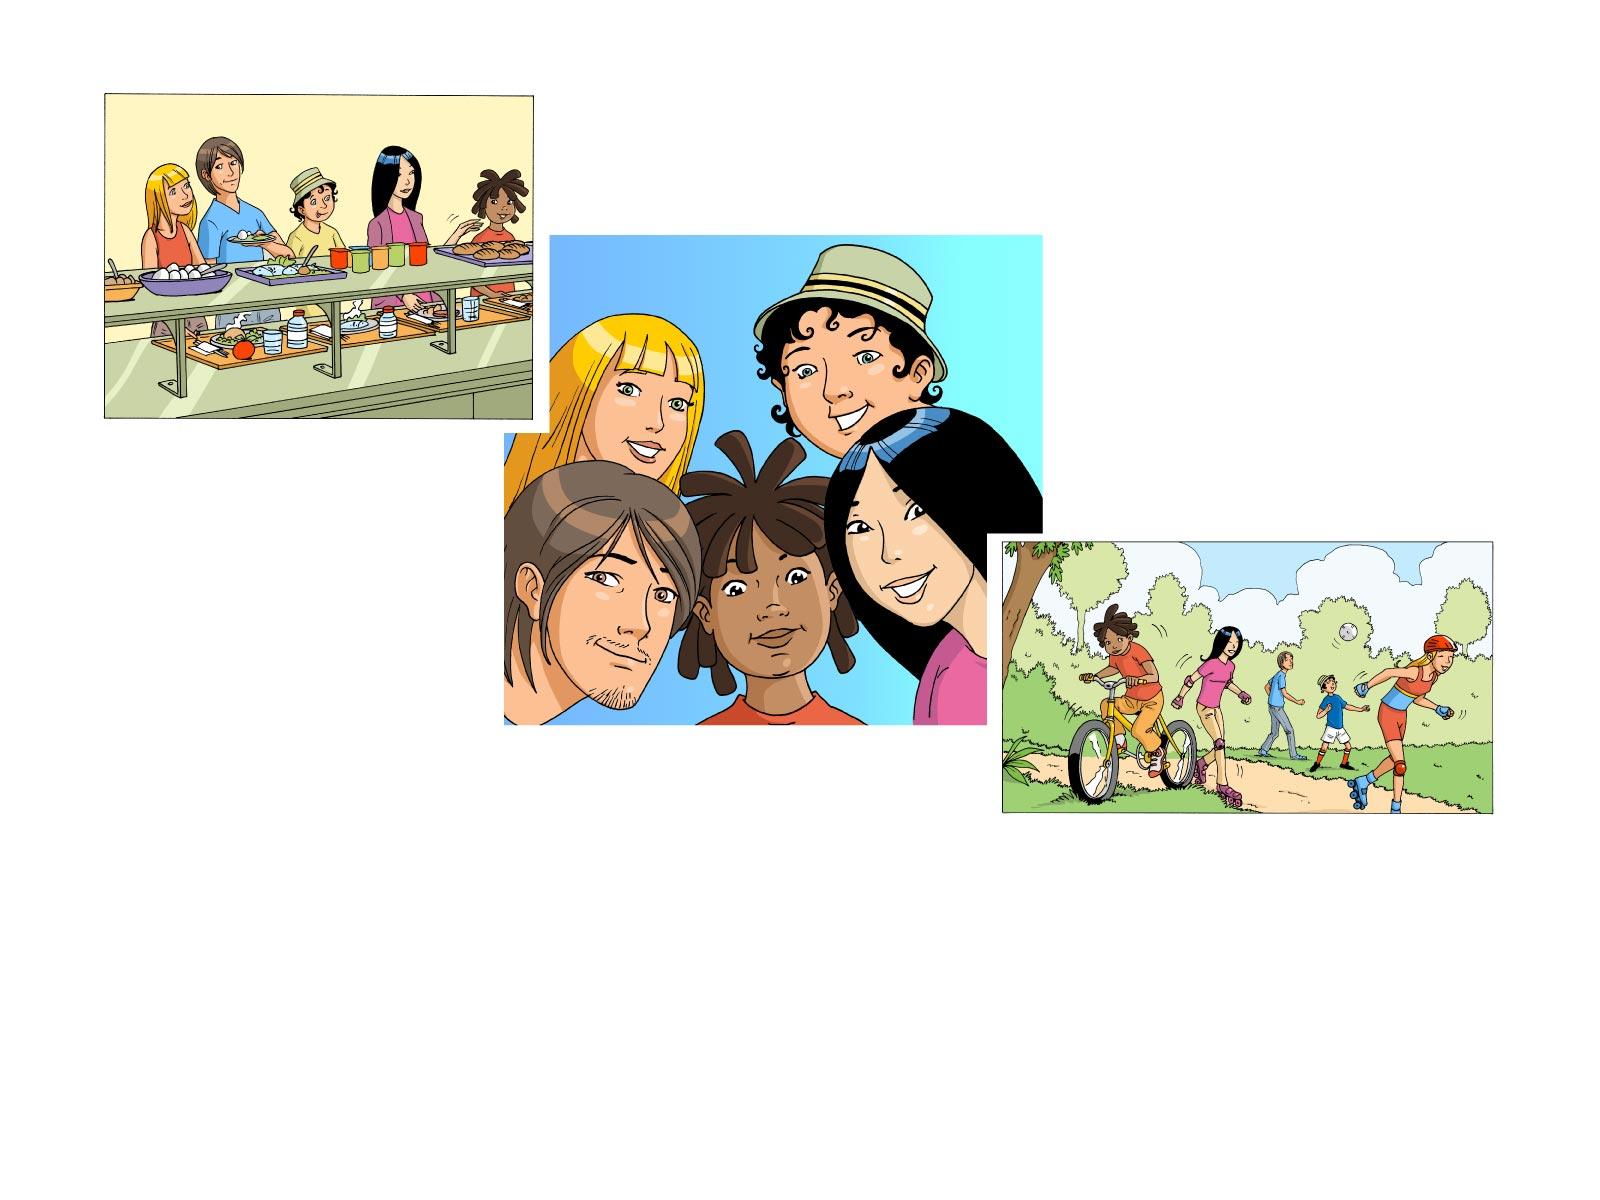 illustrations-olivierlediscot-6359